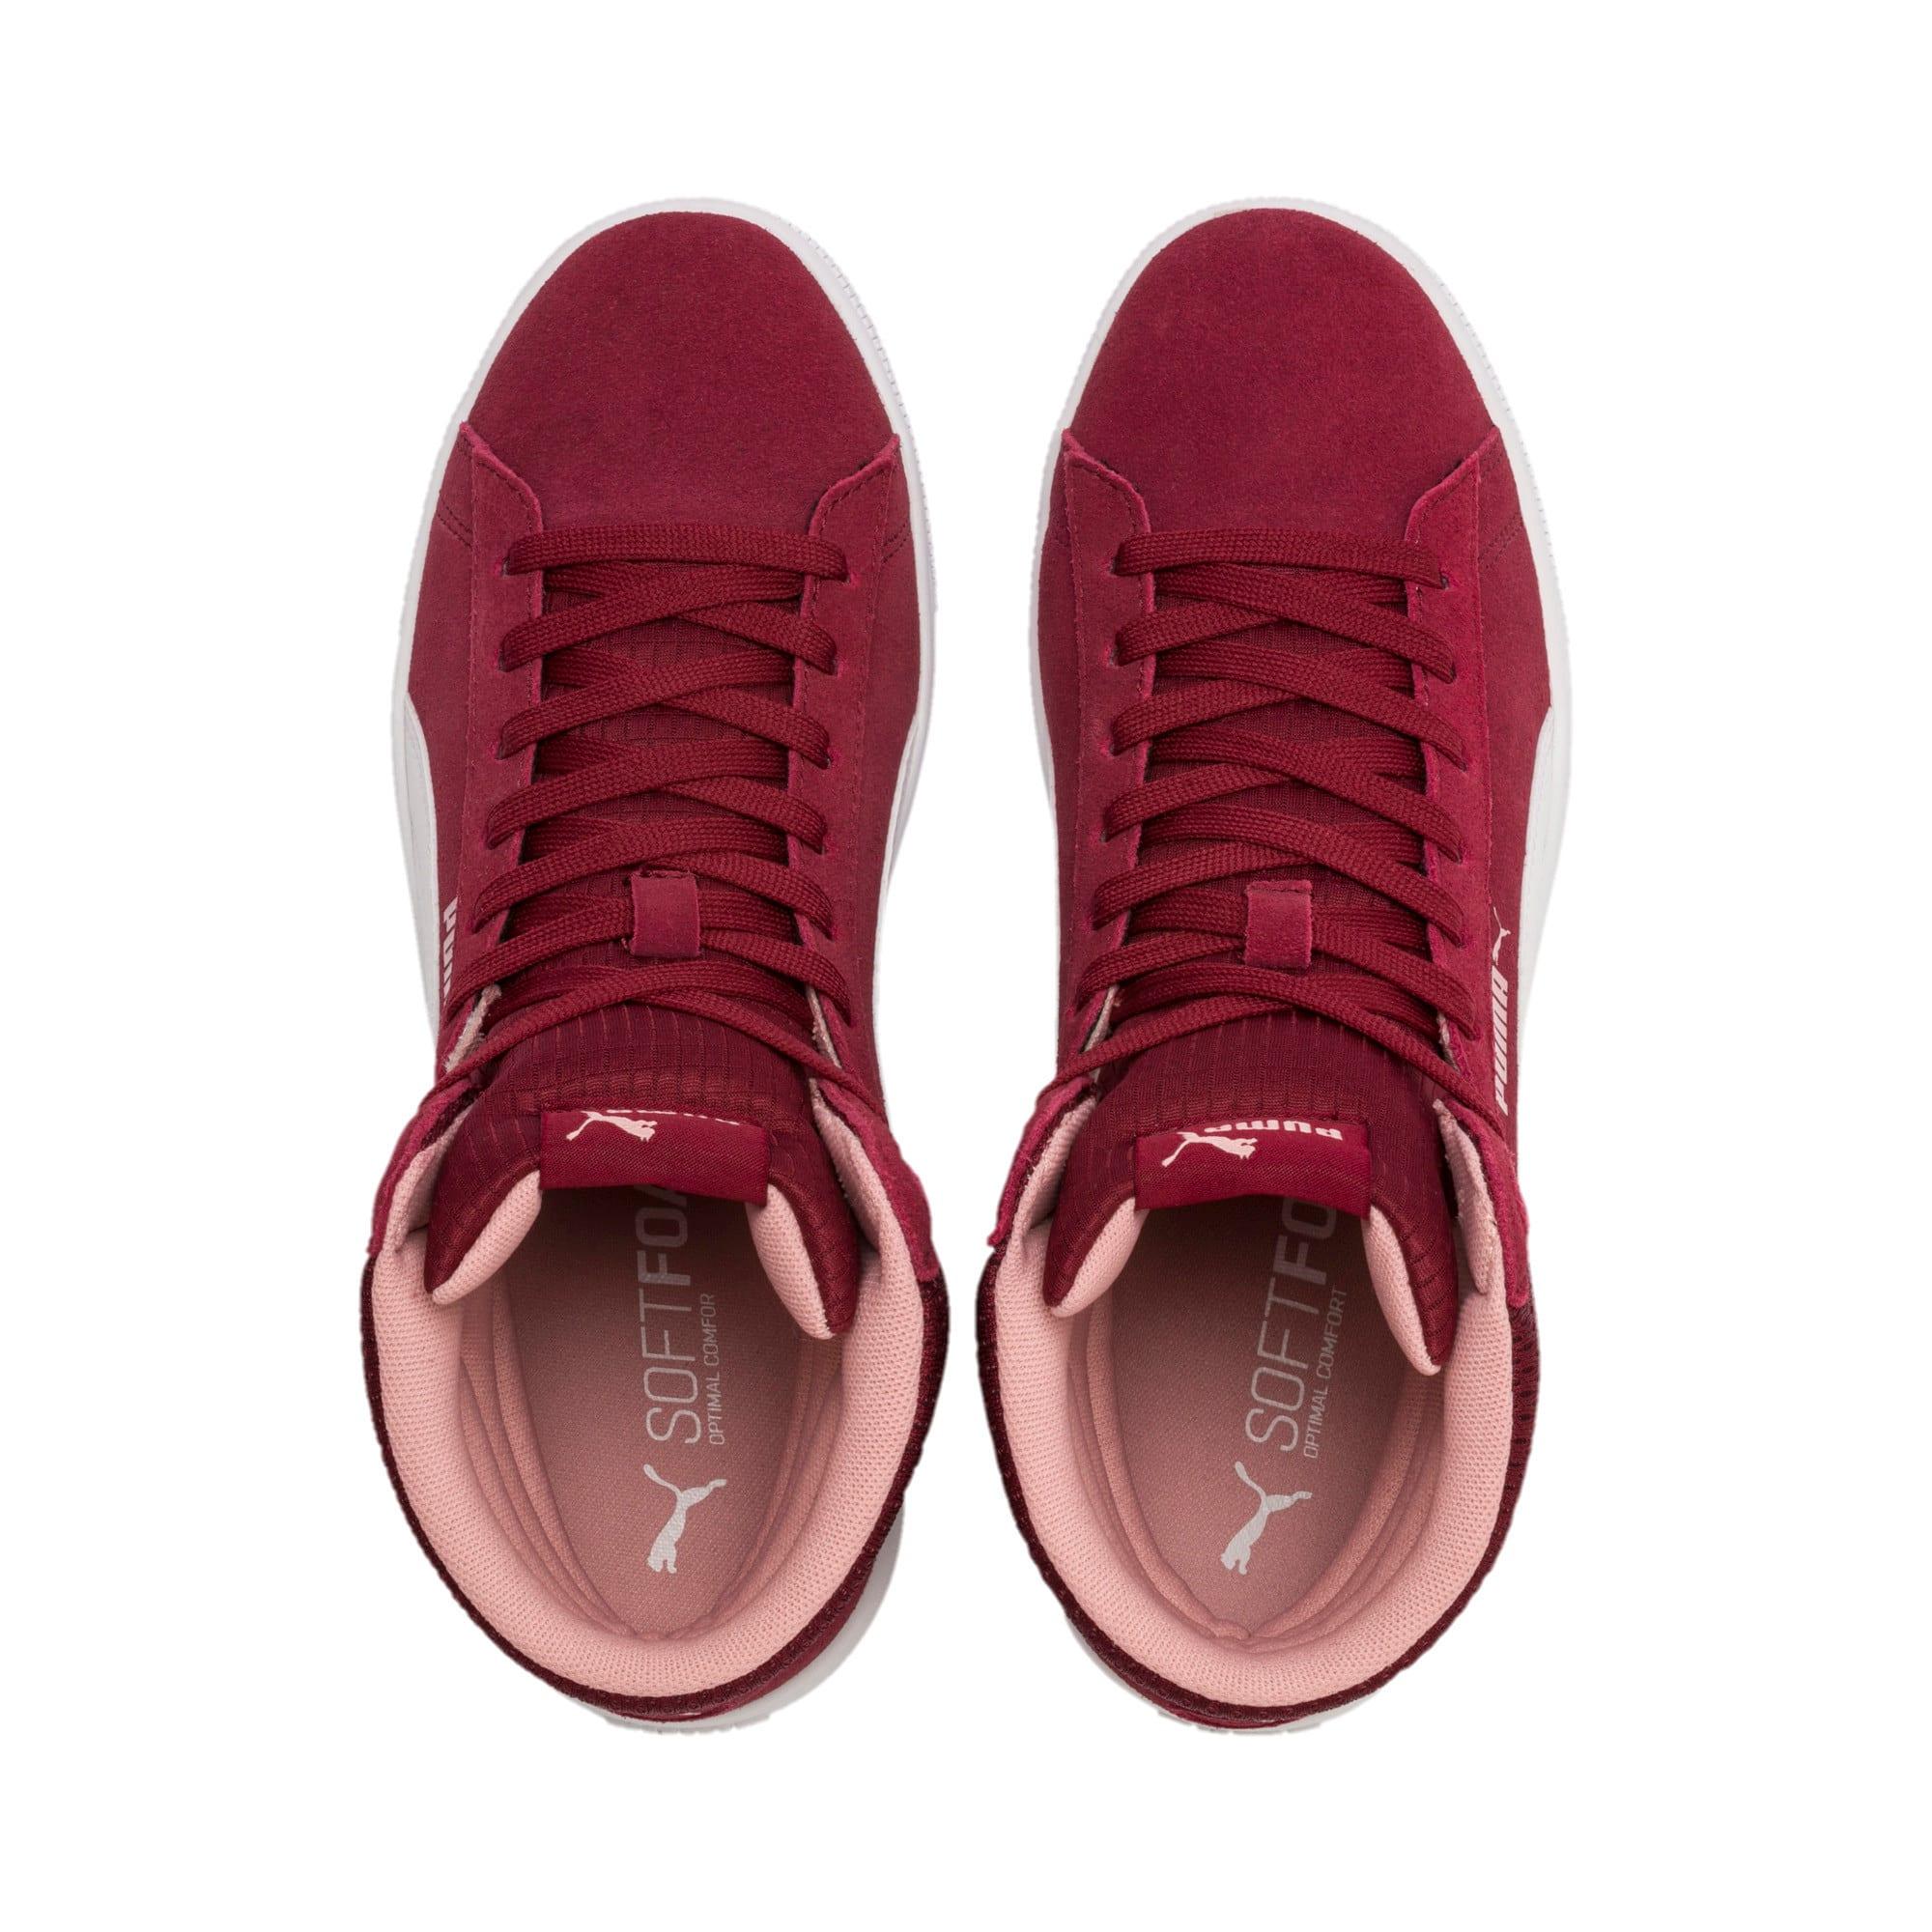 Thumbnail 3 of Vikky v2 Mid-Cut Women's Basketball Shoes, Cordovan-White-Bridal Rose, medium-IND